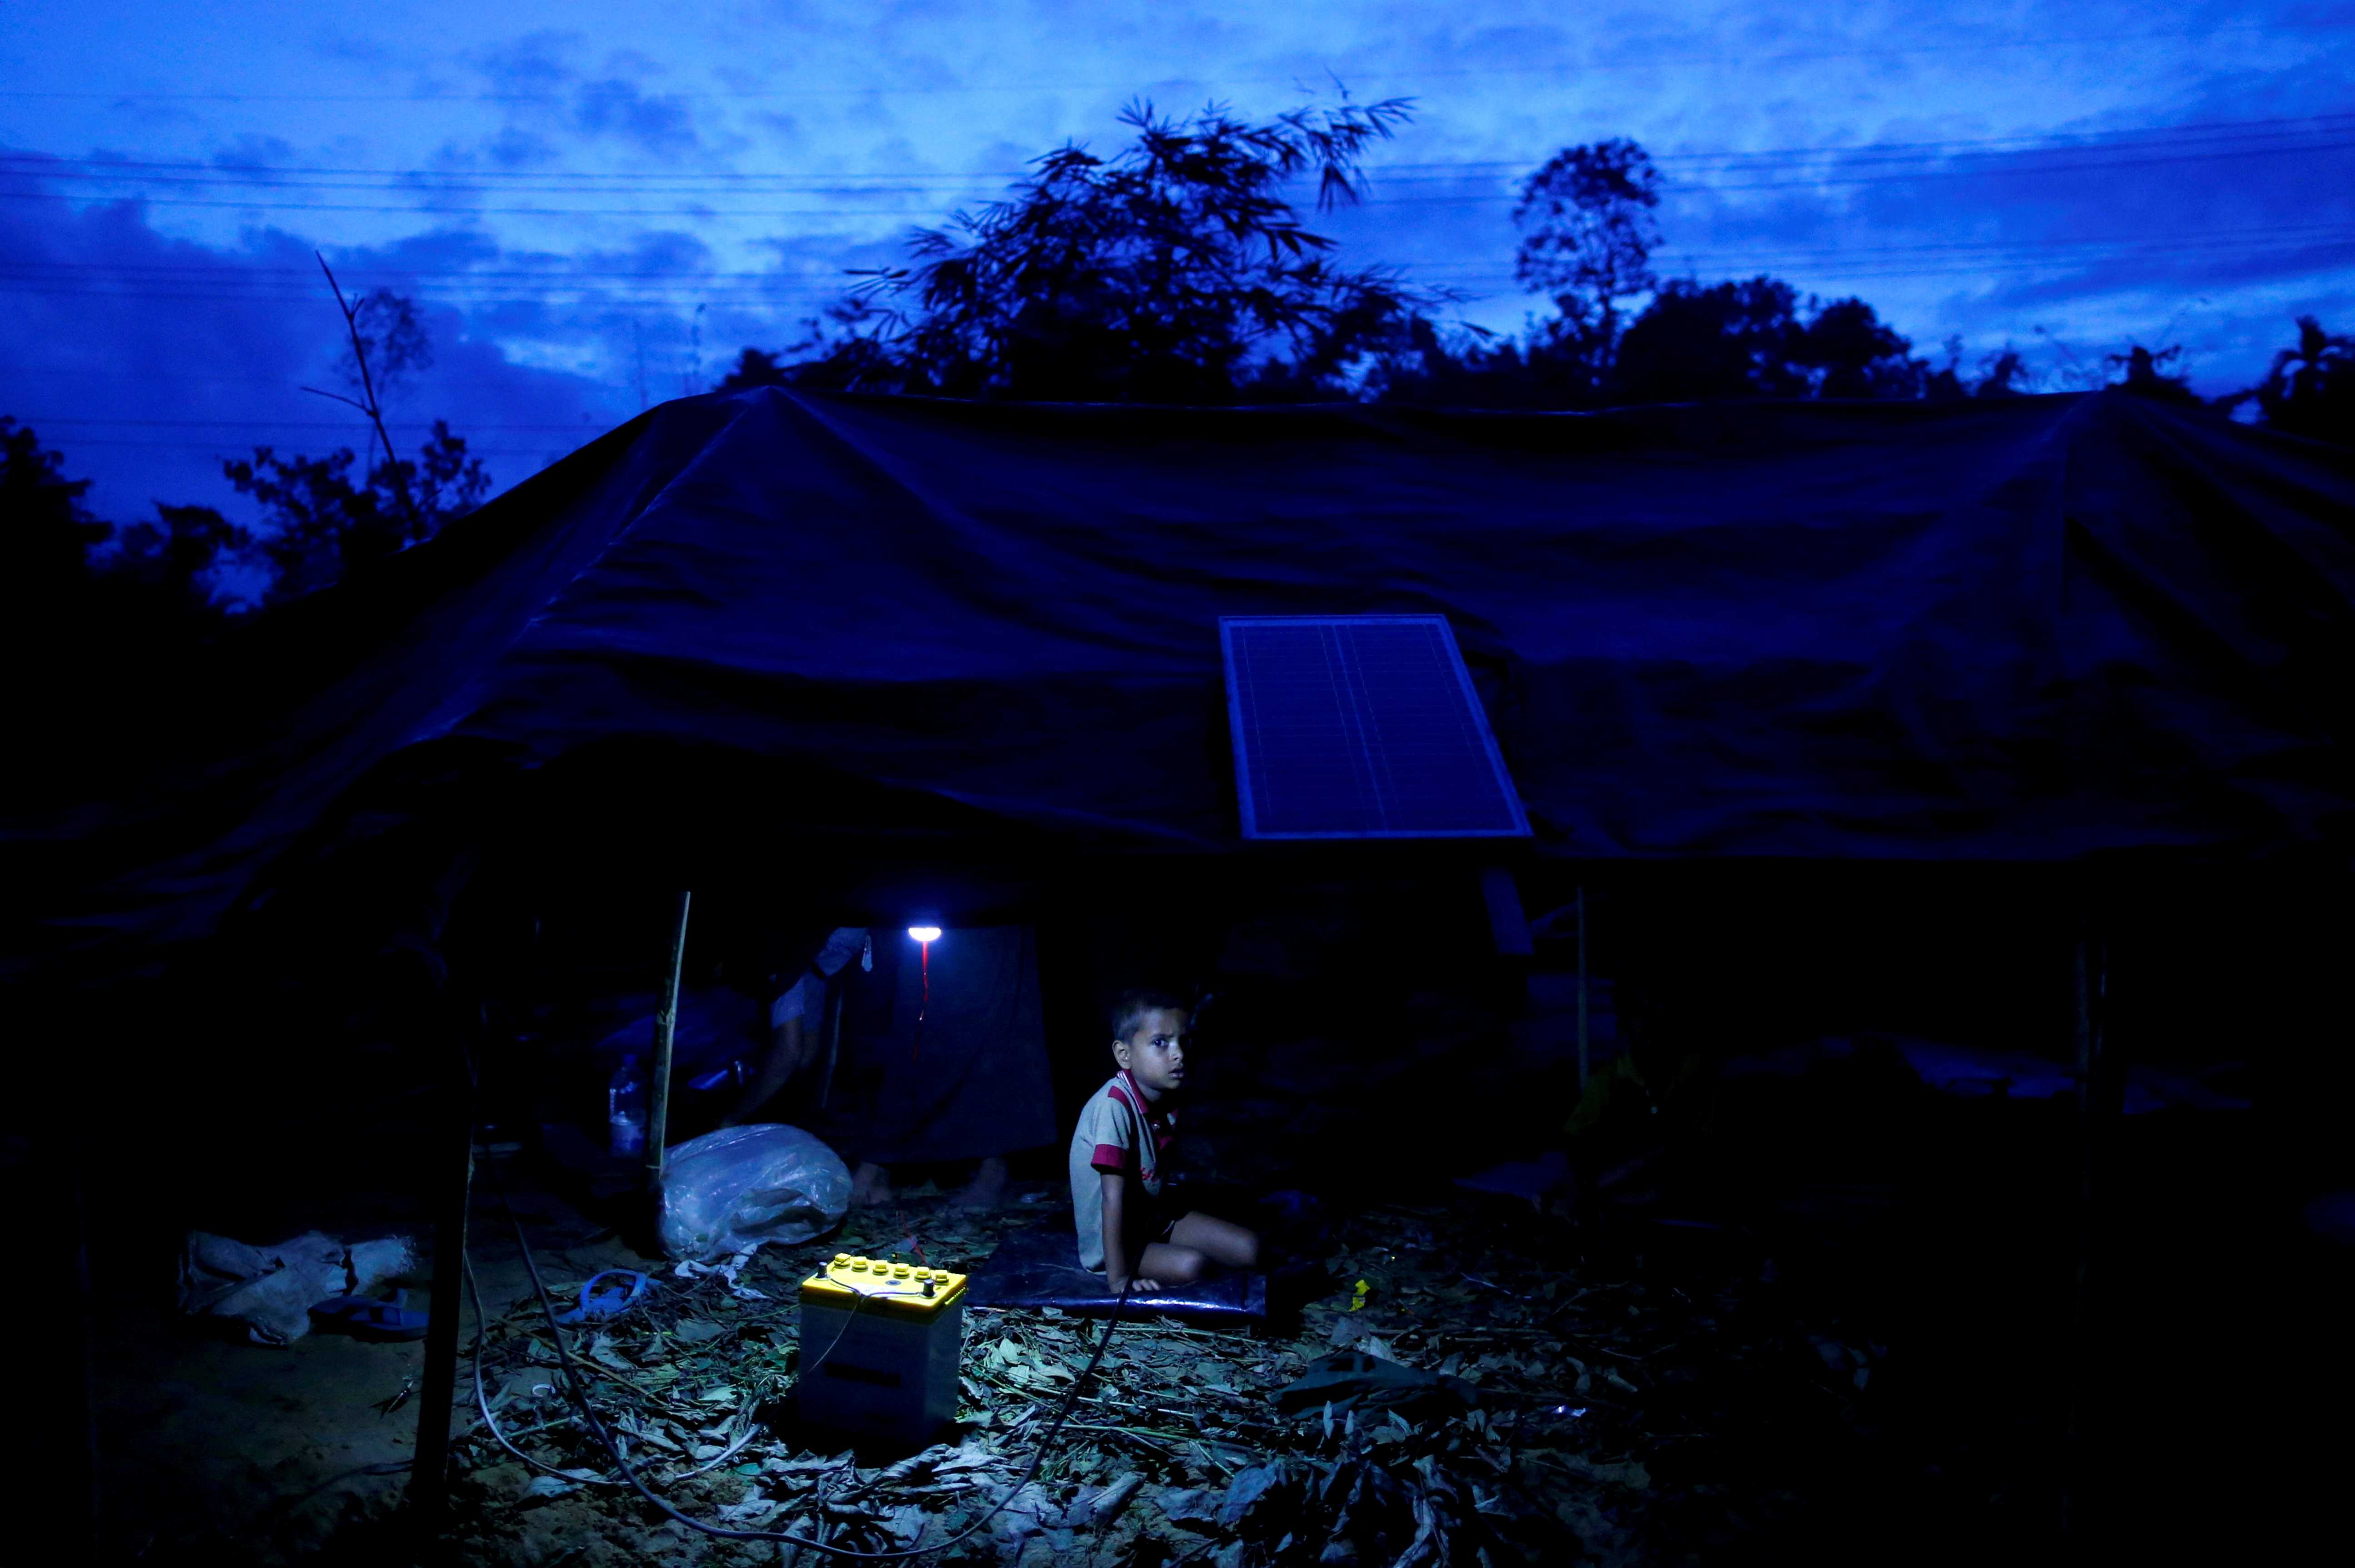 A Rohingya refugee boy sits inside his temporary shelter near Balukhali in Cox's Bazar, Bangladesh, September 12, 2017. REUTERS/Danish Siddiqui/File Photo/File Photo